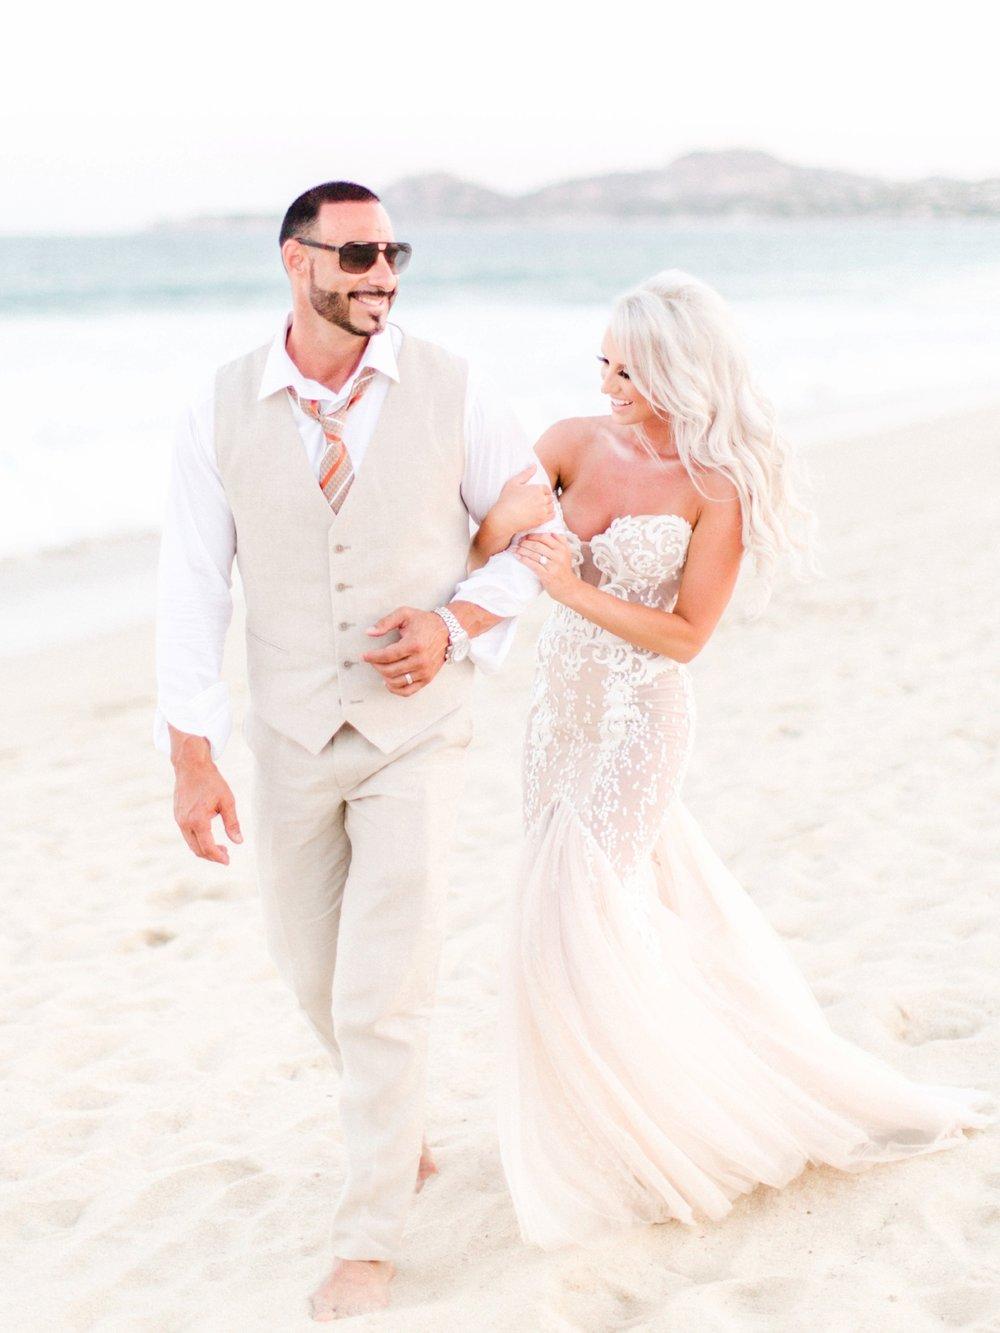 Ziva_Cabo_Mexico_Wedding_Rhianna_Mercier_Photography_Carolyn_Aaron_2018-6682.jpg